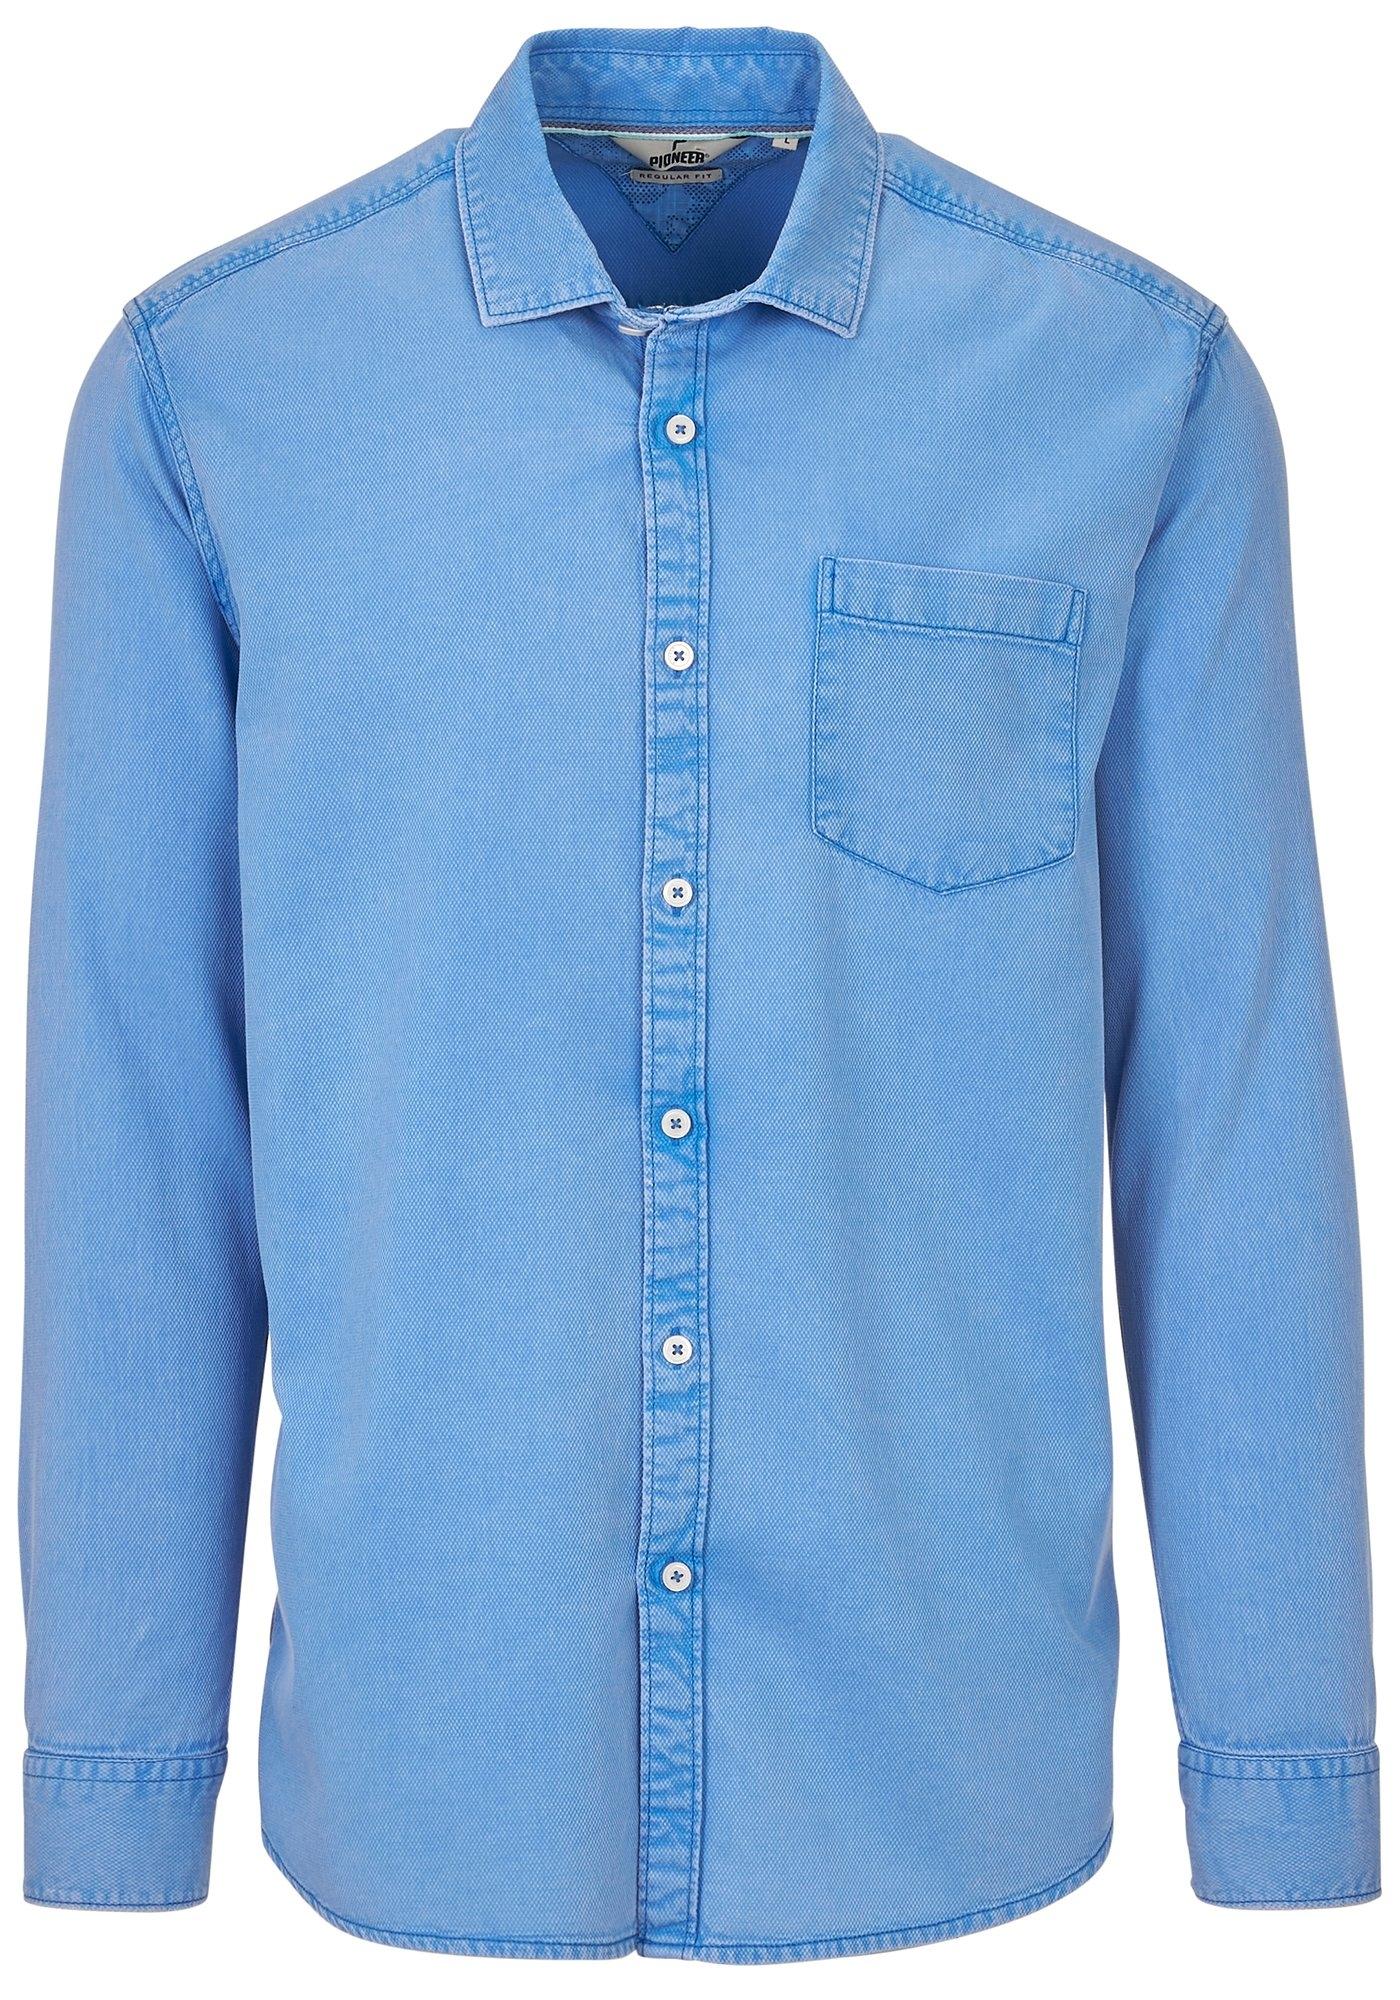 Heren Overhemd Blauw.Pioneer Herenoverhemd Herenoverhemd Shirt Makkelijk Besteld Otto